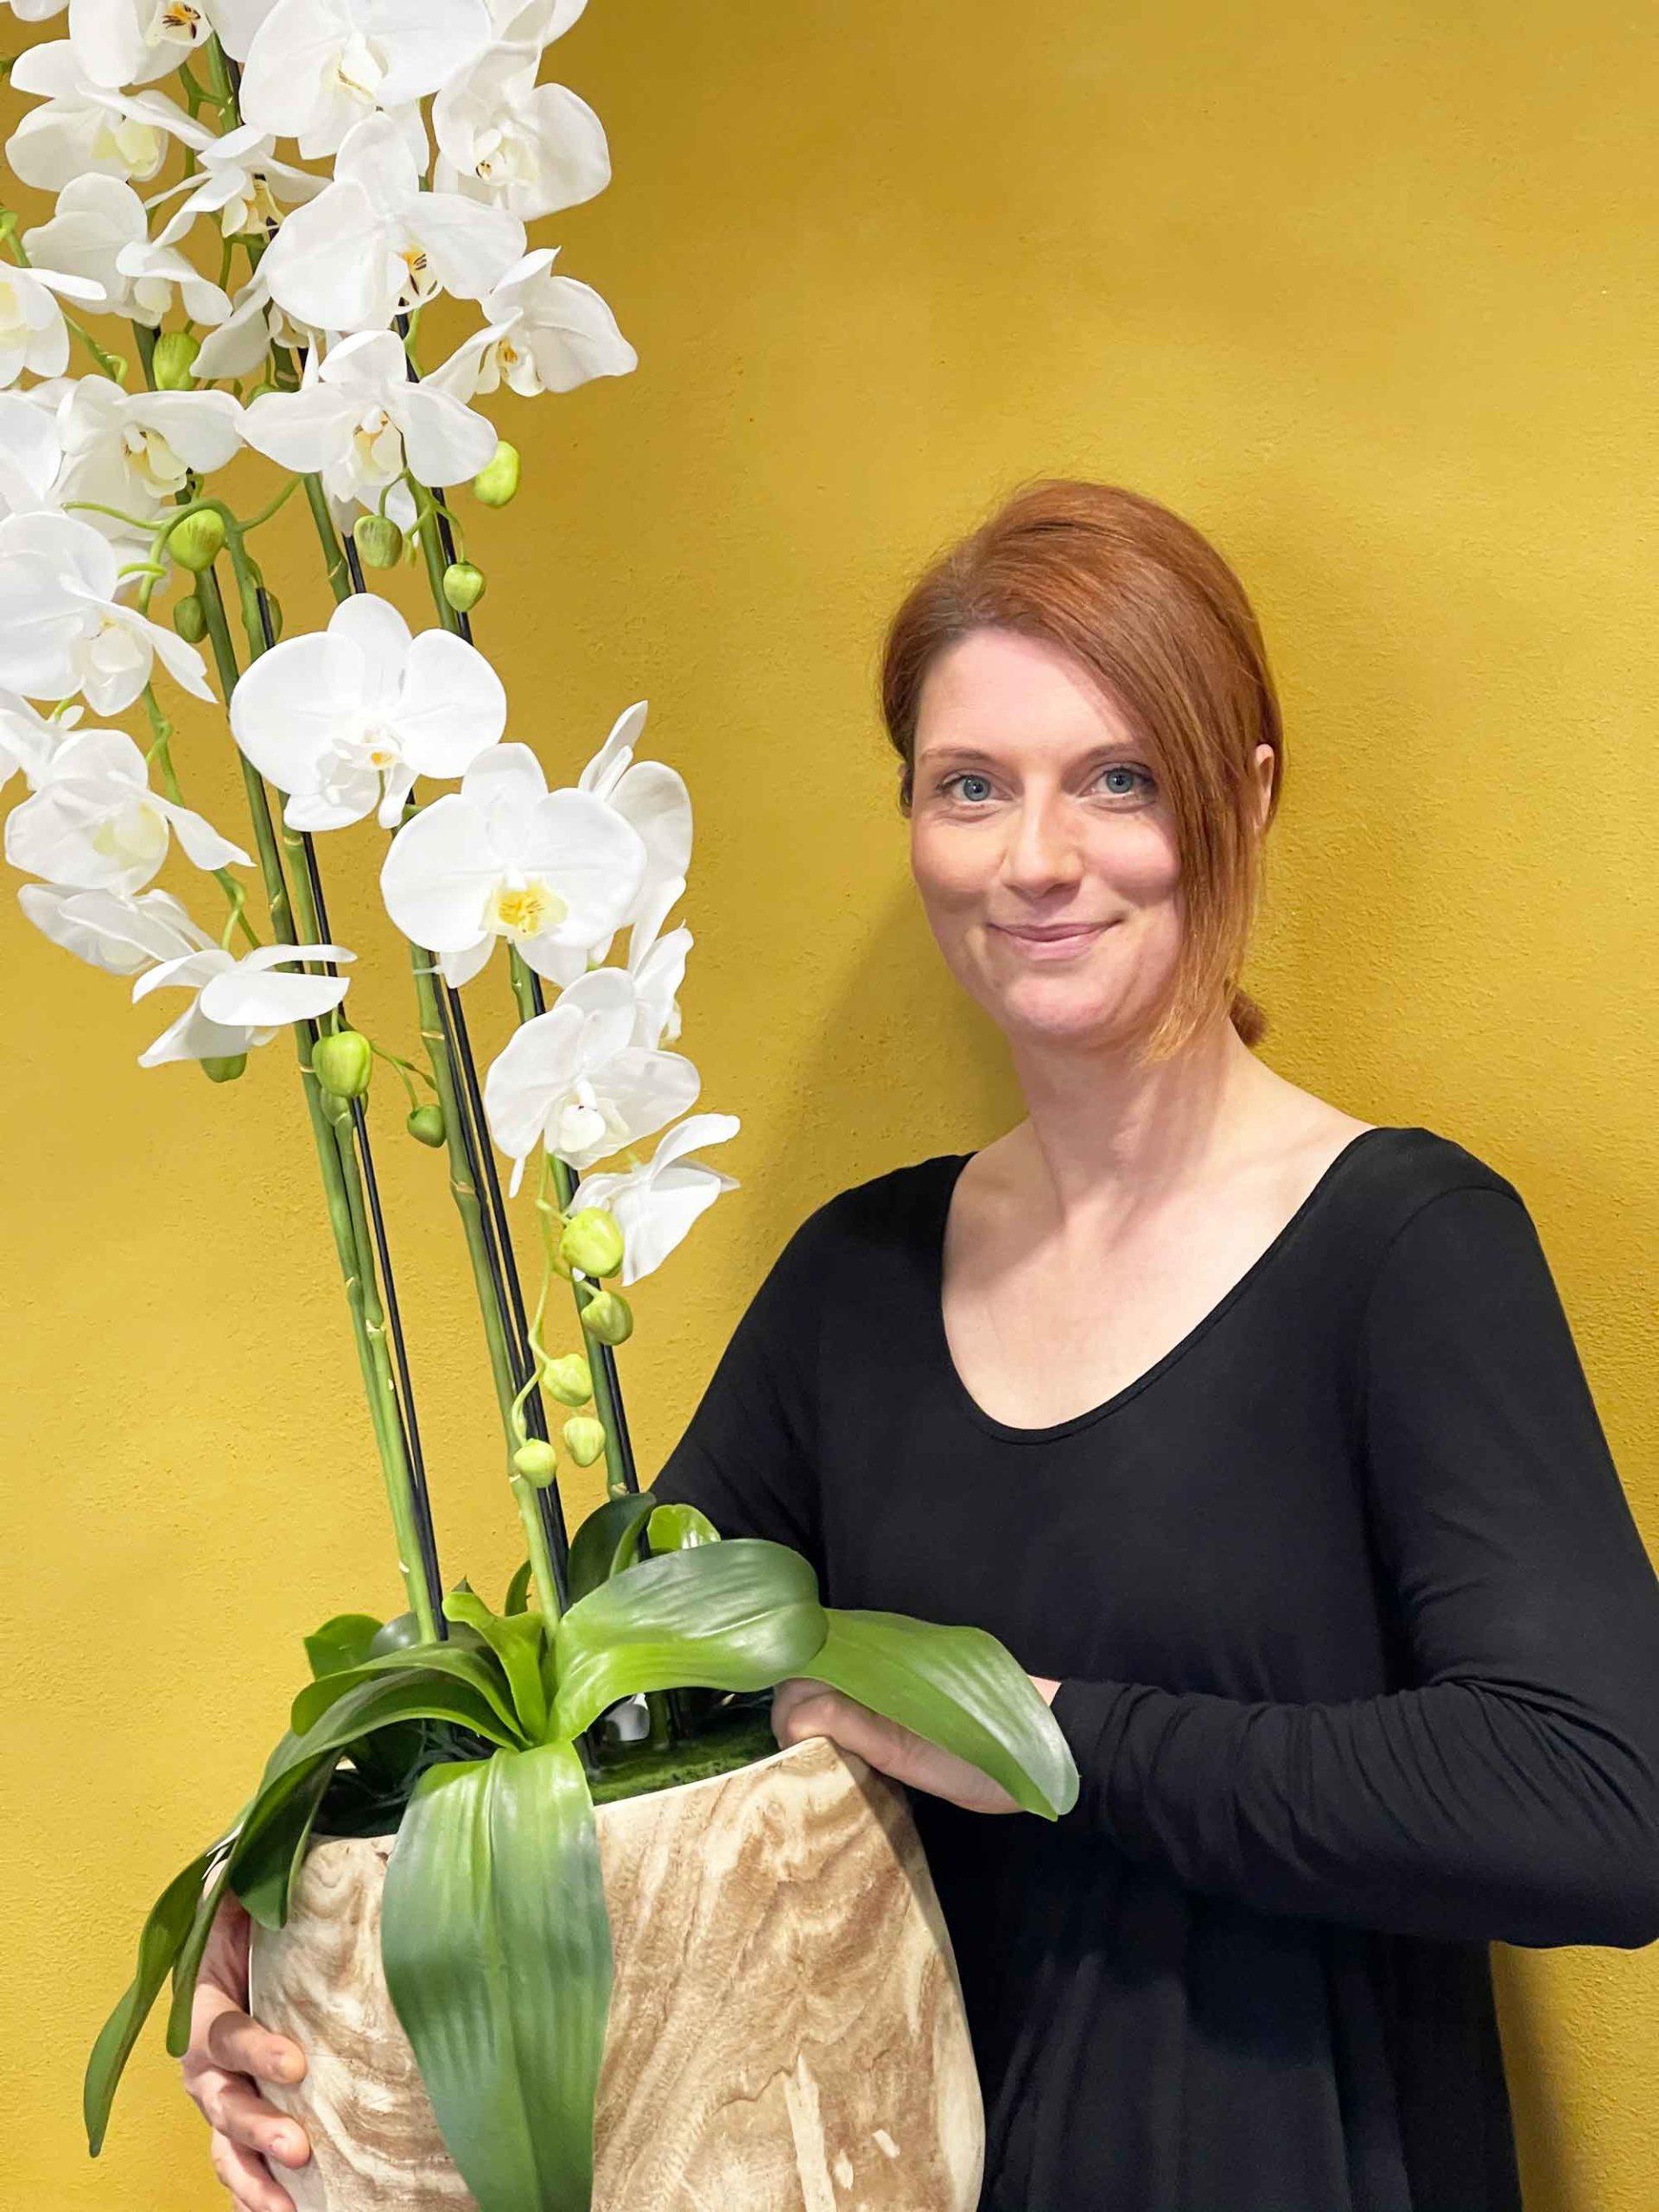 Frau mit Vase aus Holz